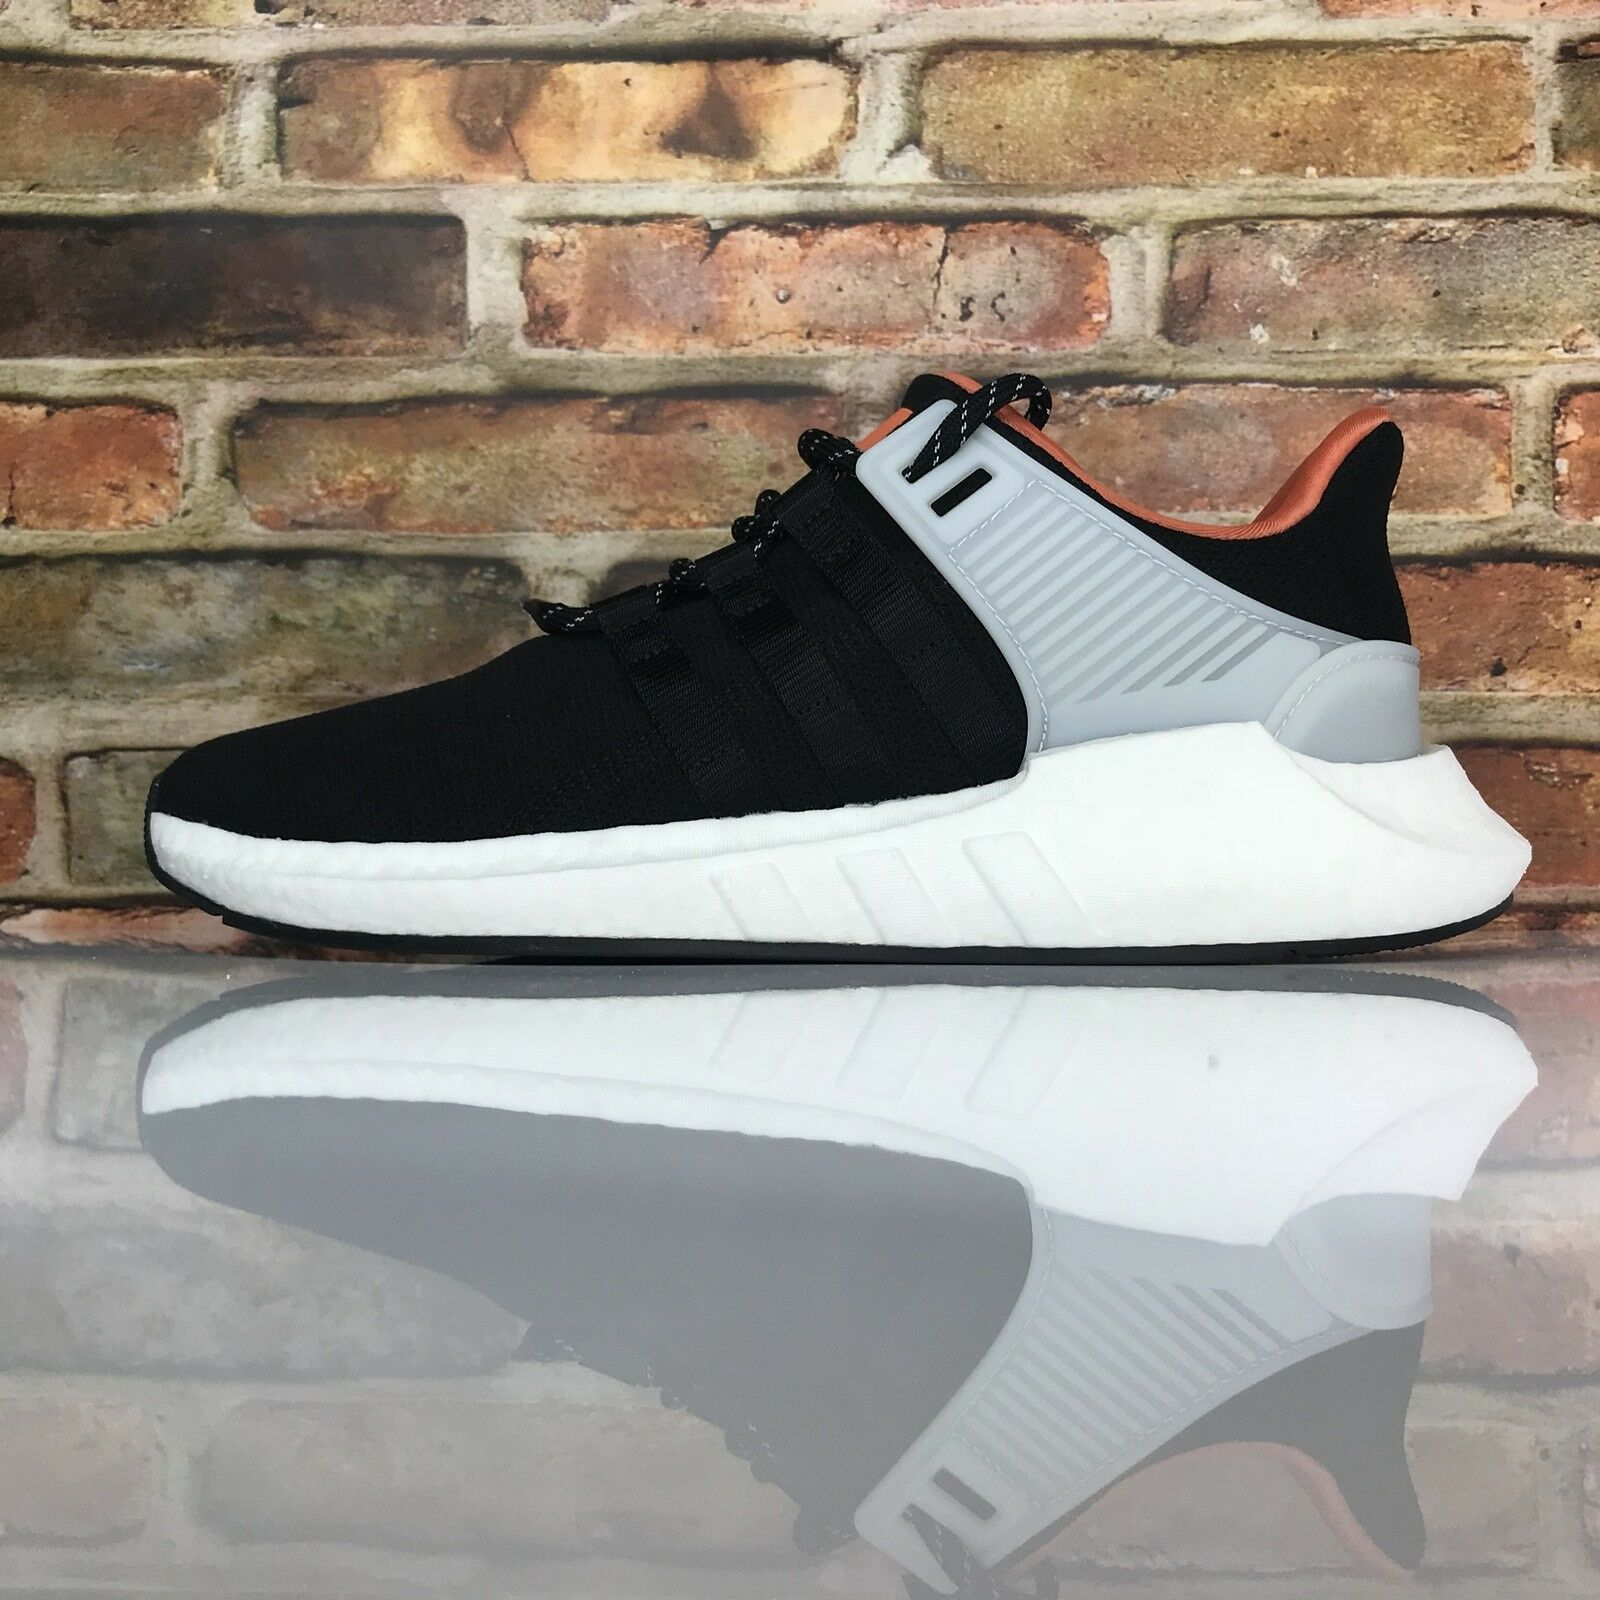 Adidas Boost Originals Eqt Equipamiento Soporte 93-17